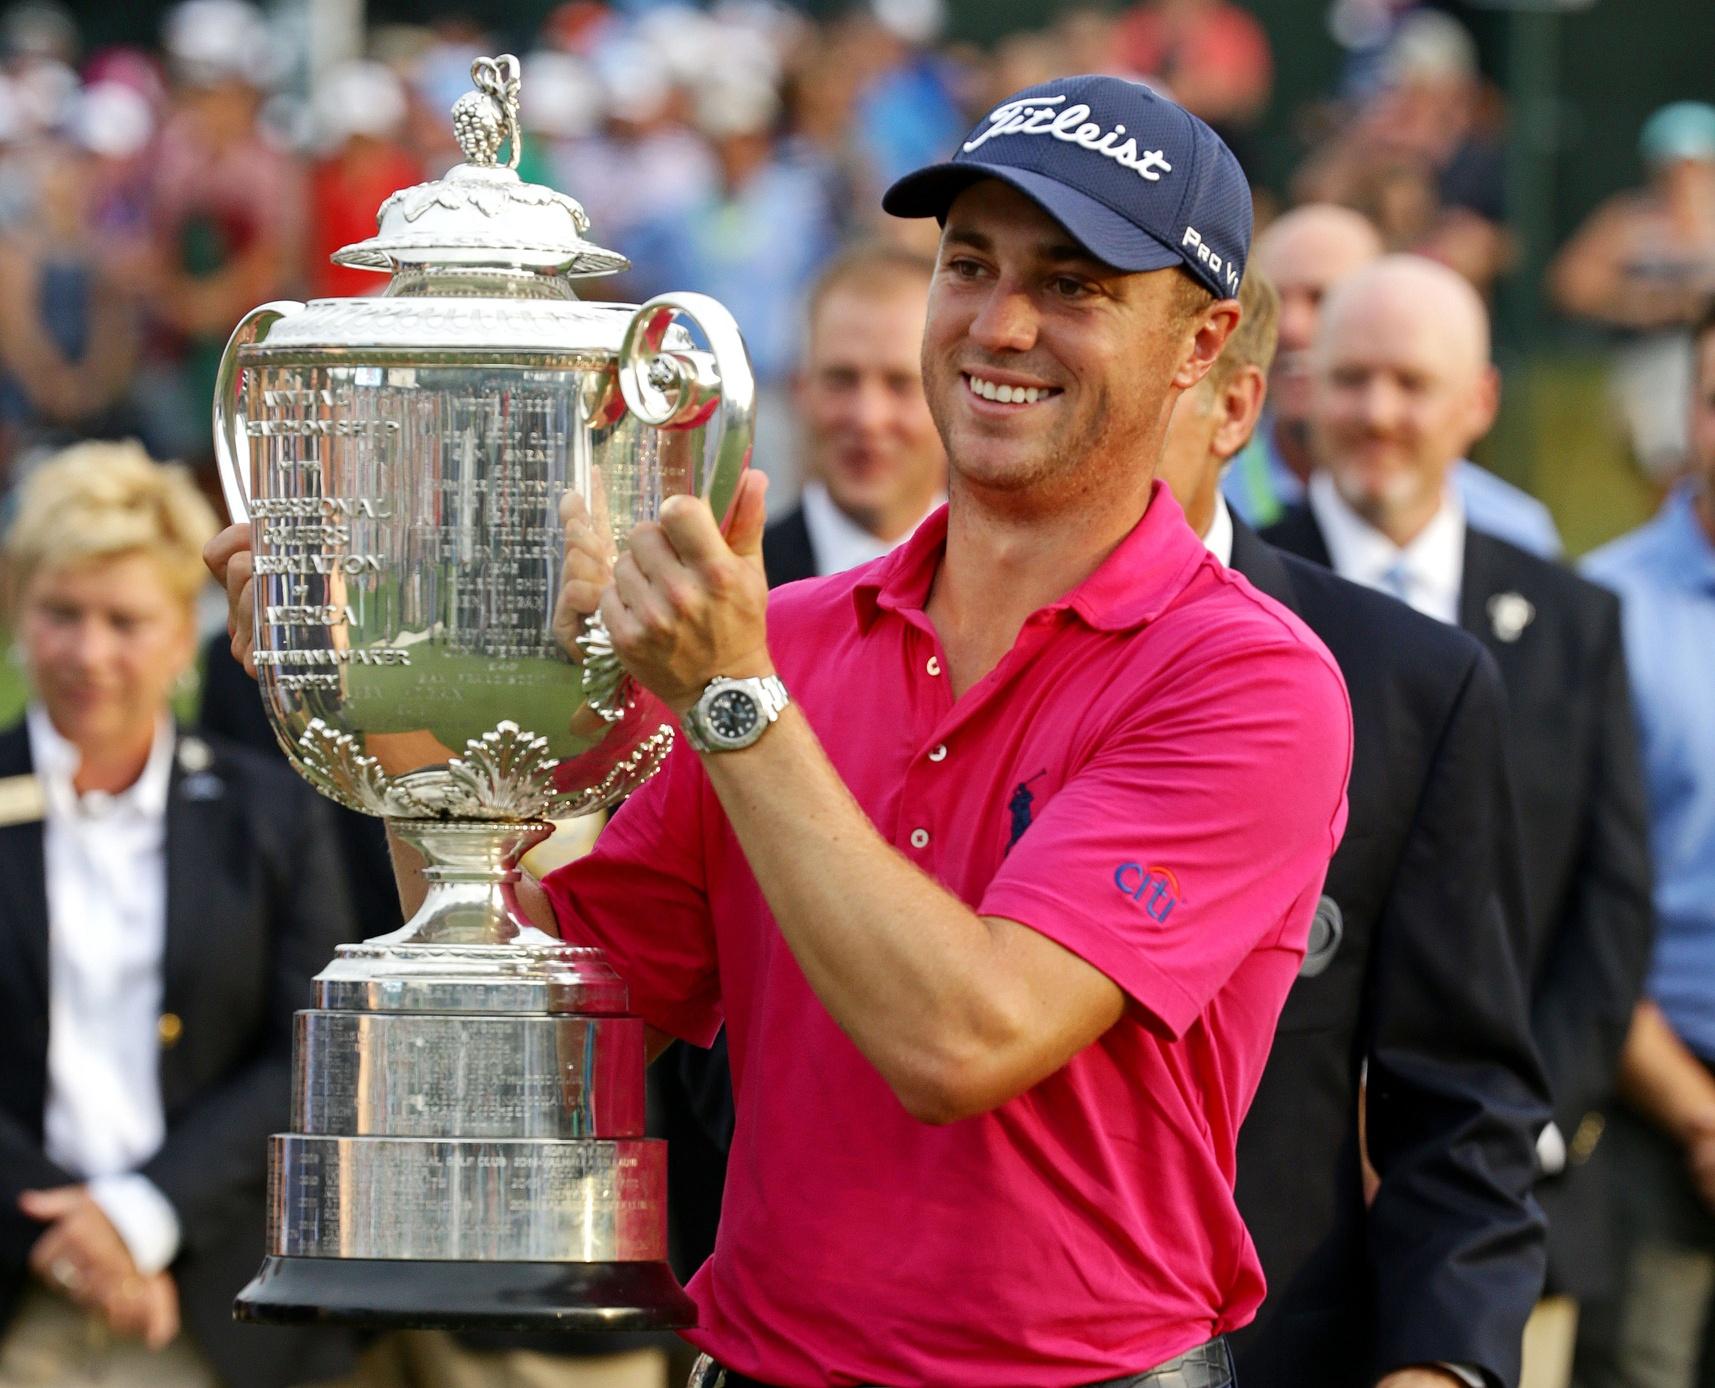 Justin Thomas wins the 2017 PGA Championship